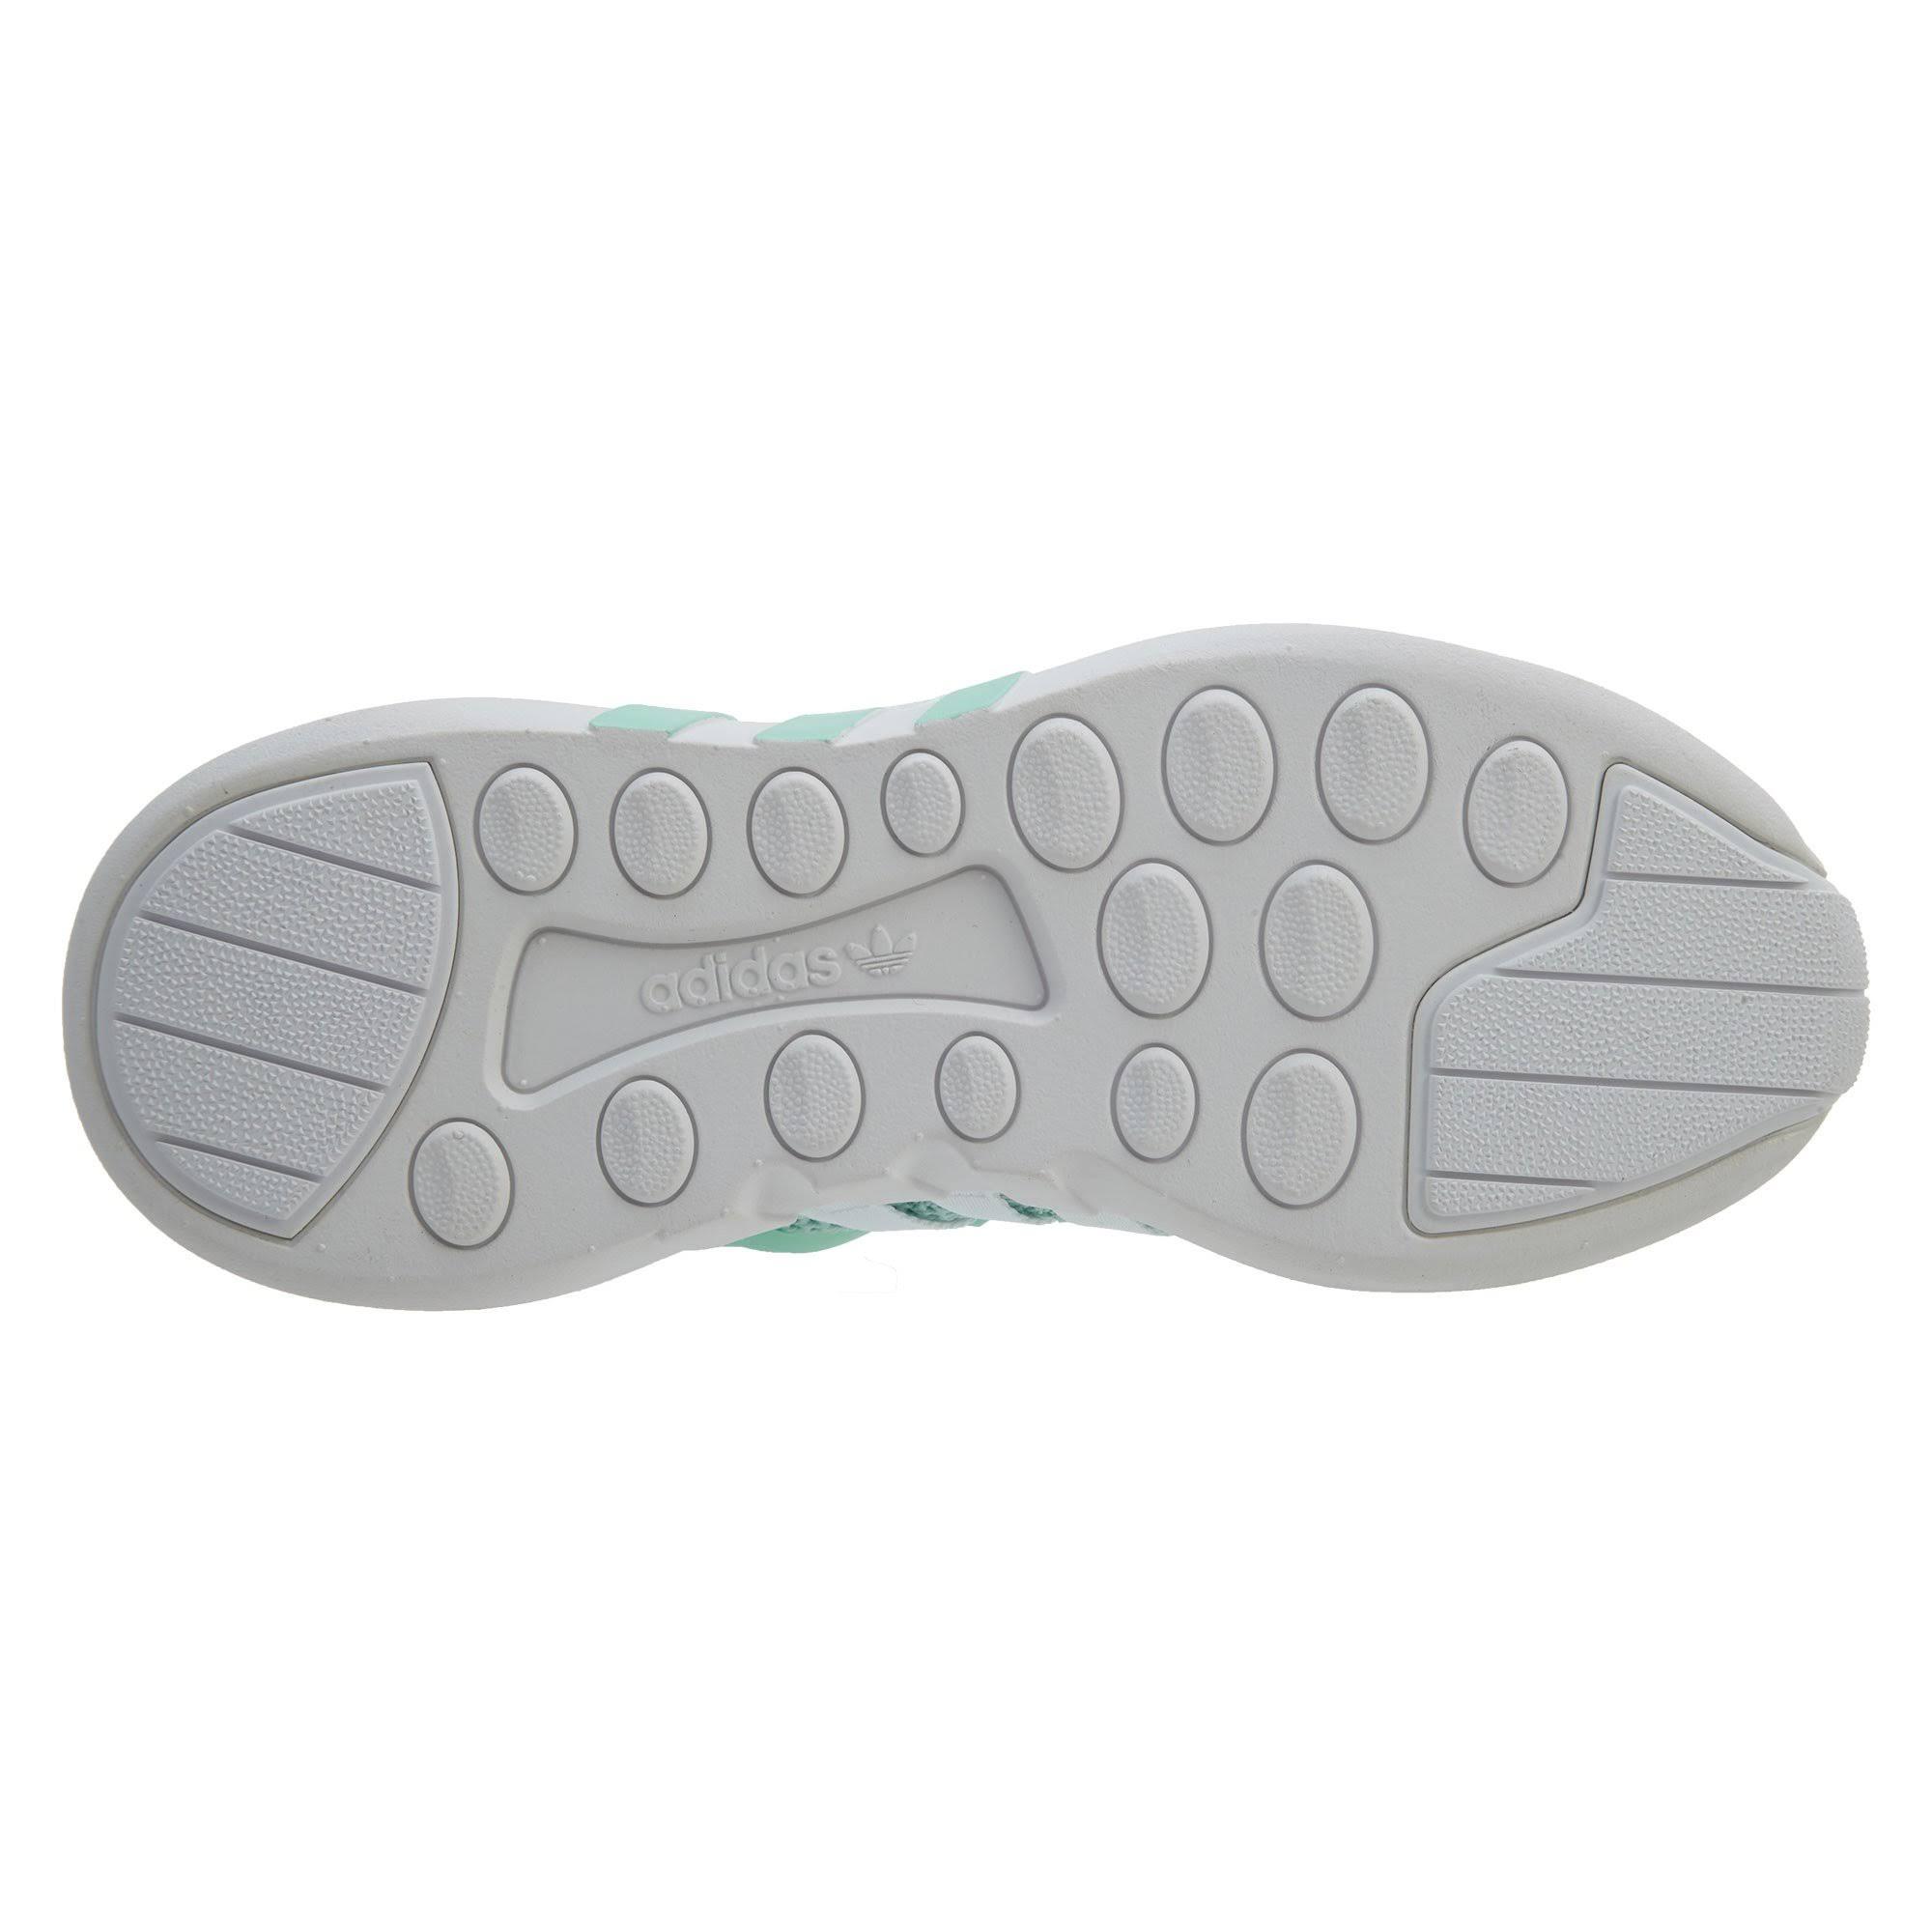 Zapatillas 9 Originals Para Adv Eqt Talla Mujer Support 5 Adidas x8rwRq5np8